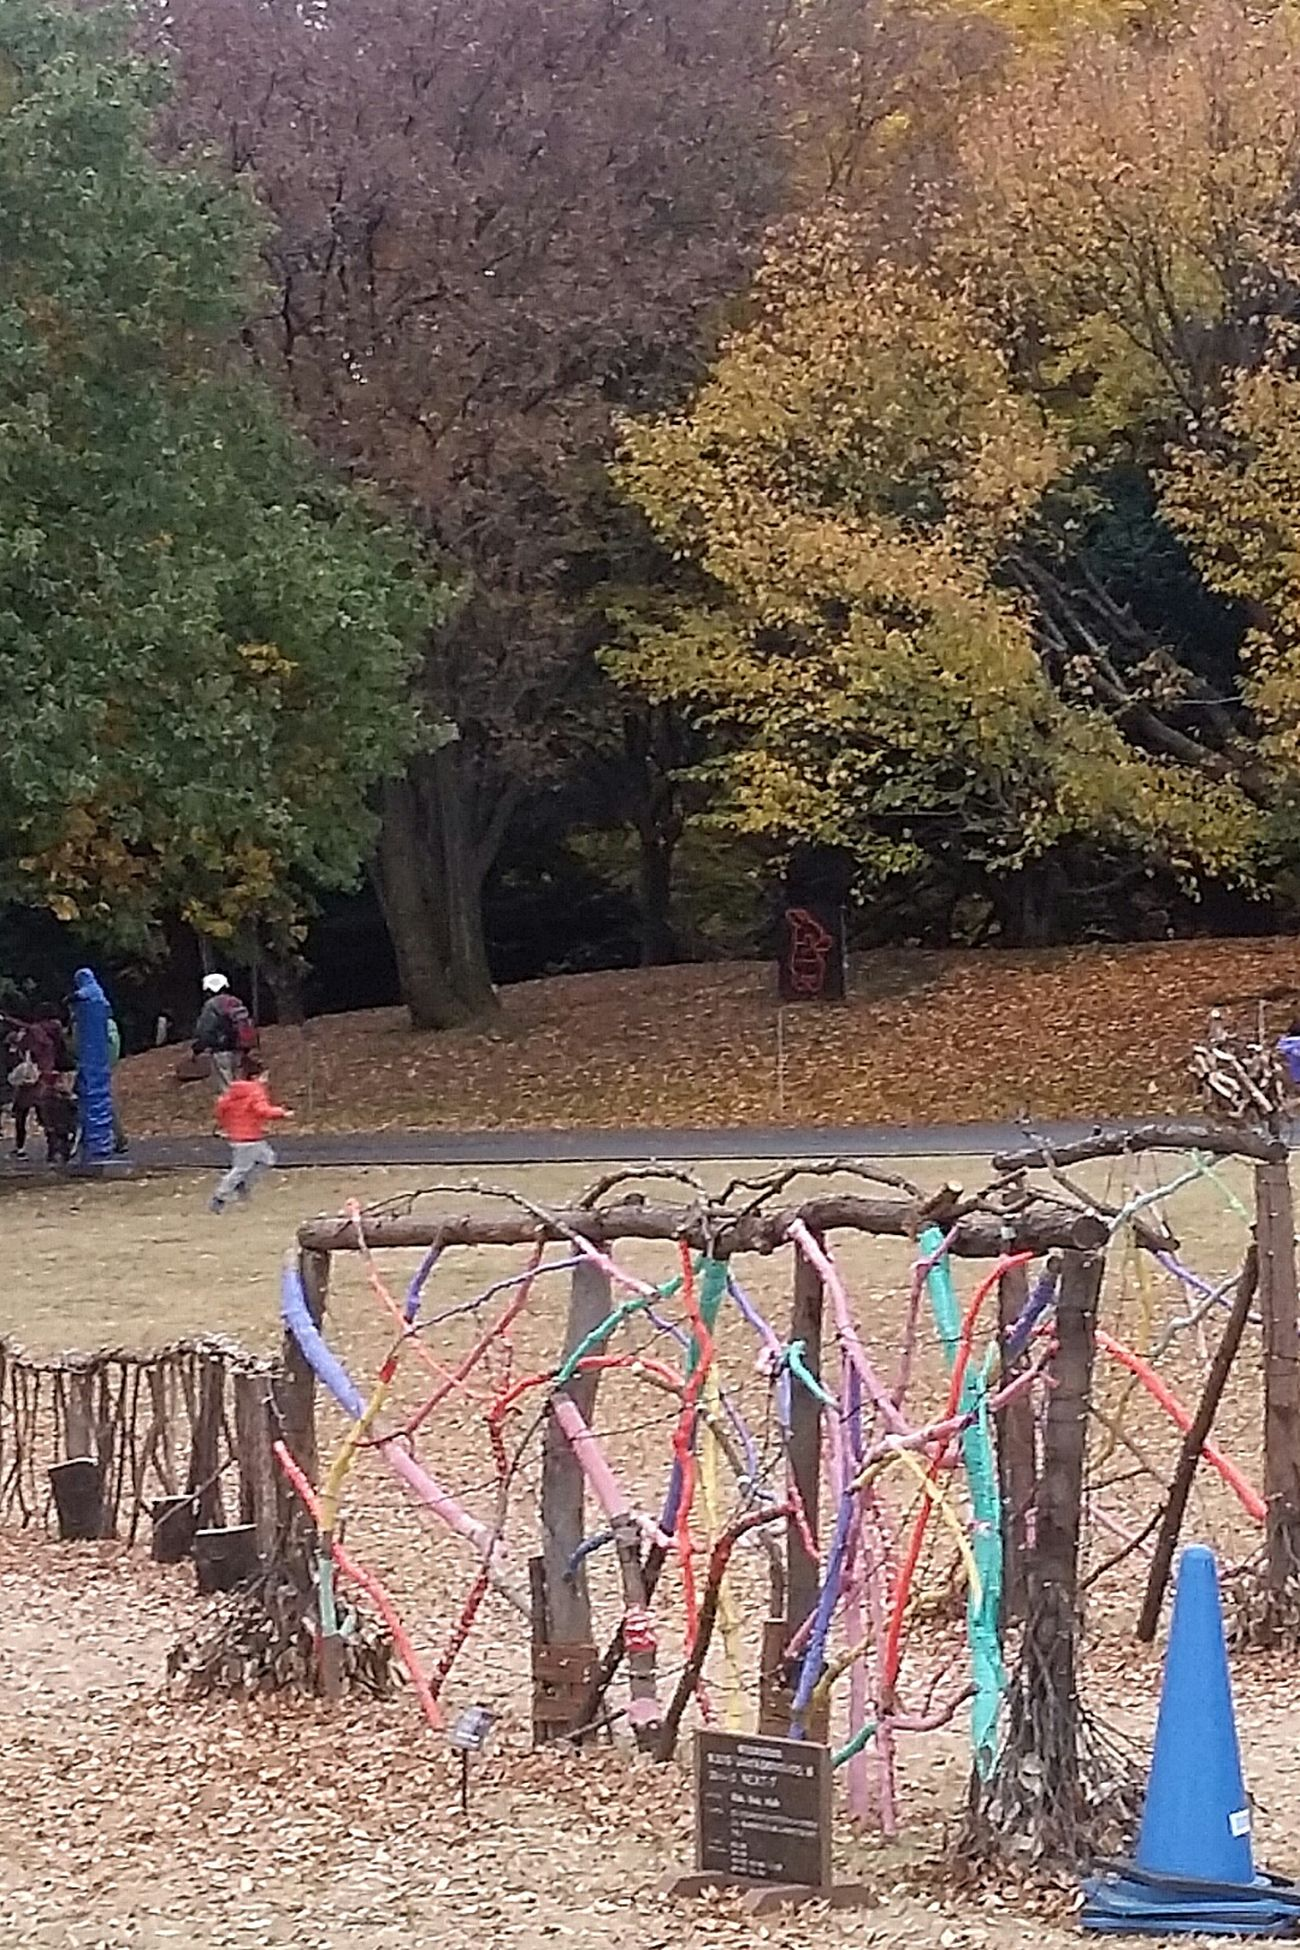 Play Area Showa Kinen Park Japan Japannov2016 Japanautumn2016 Autumn Trees The Colours Of Autumn The Colours Of Nature